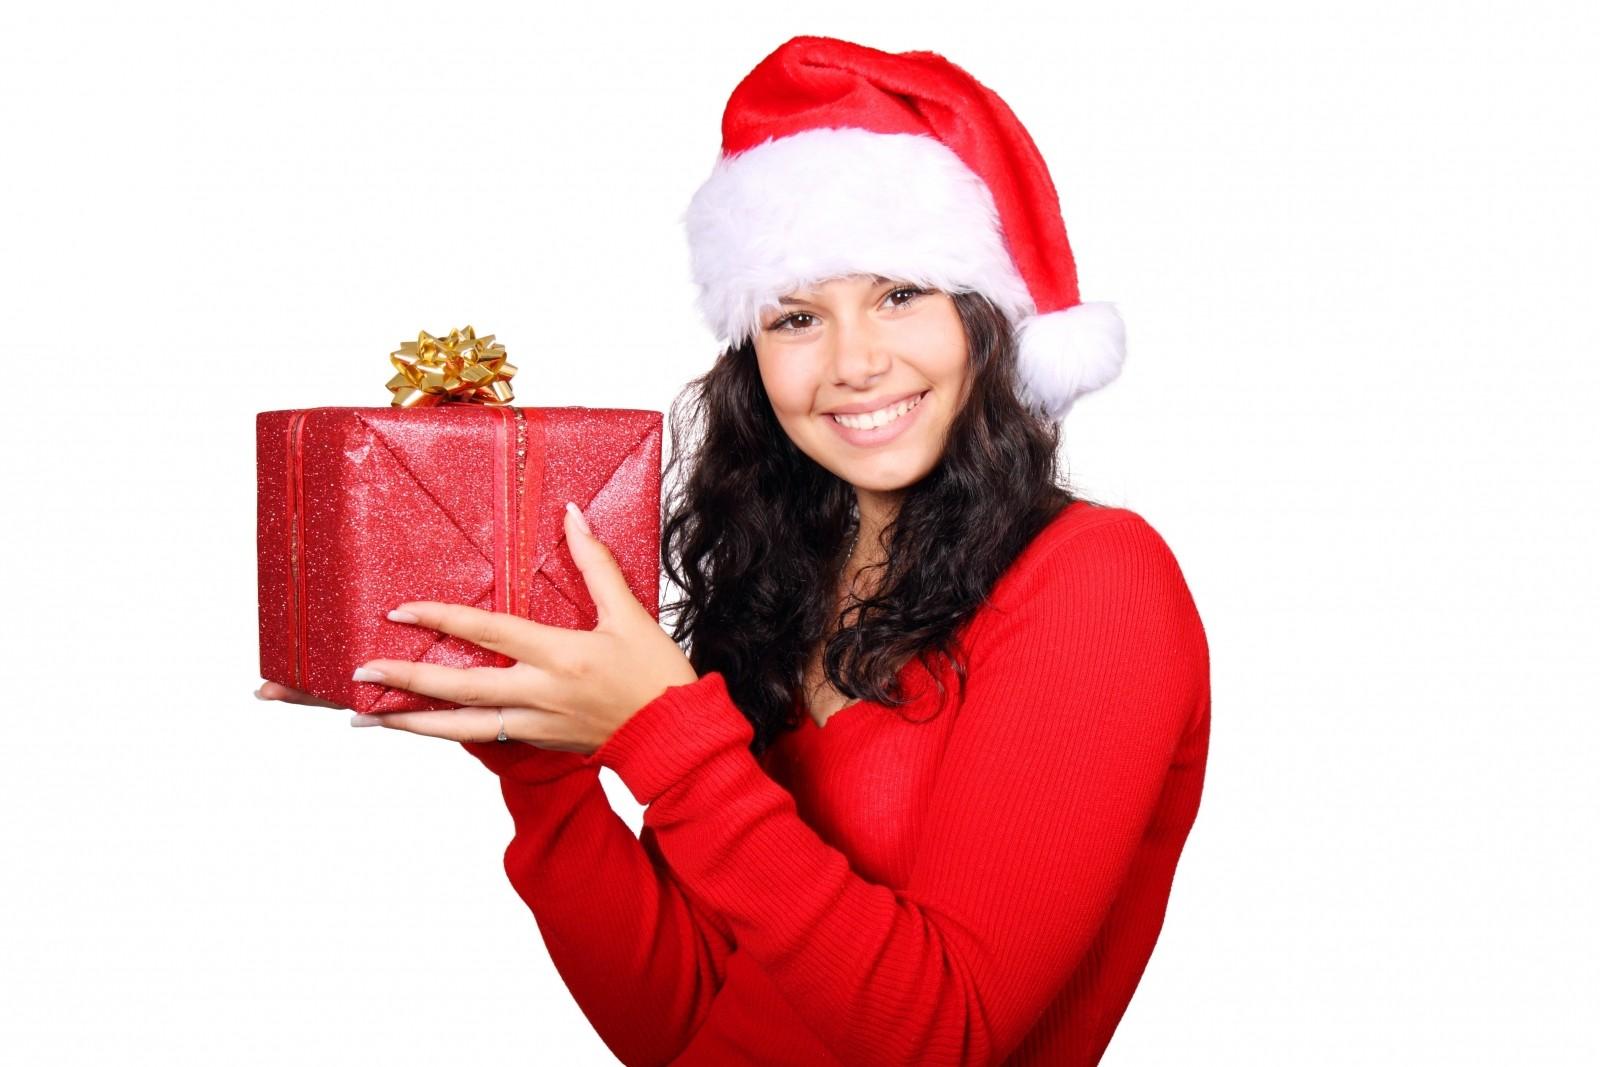 box-christmas-claus-cute-female-gift-girl-happy.jpg